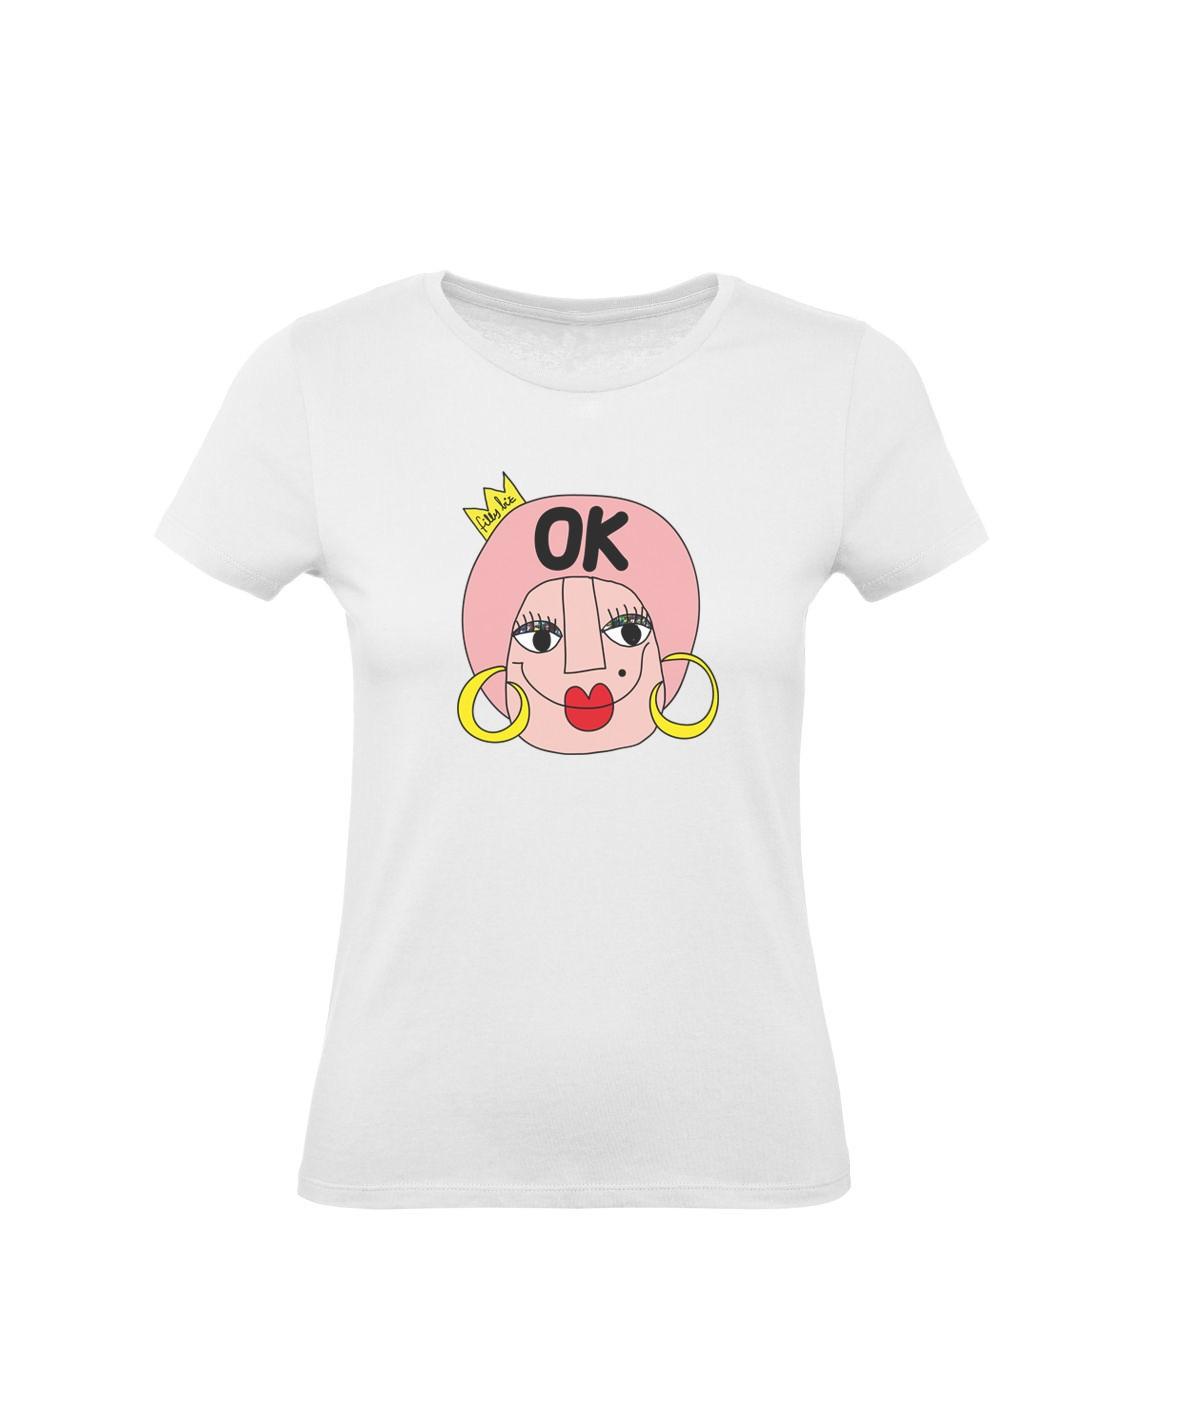 Ok ● printed t-shirt